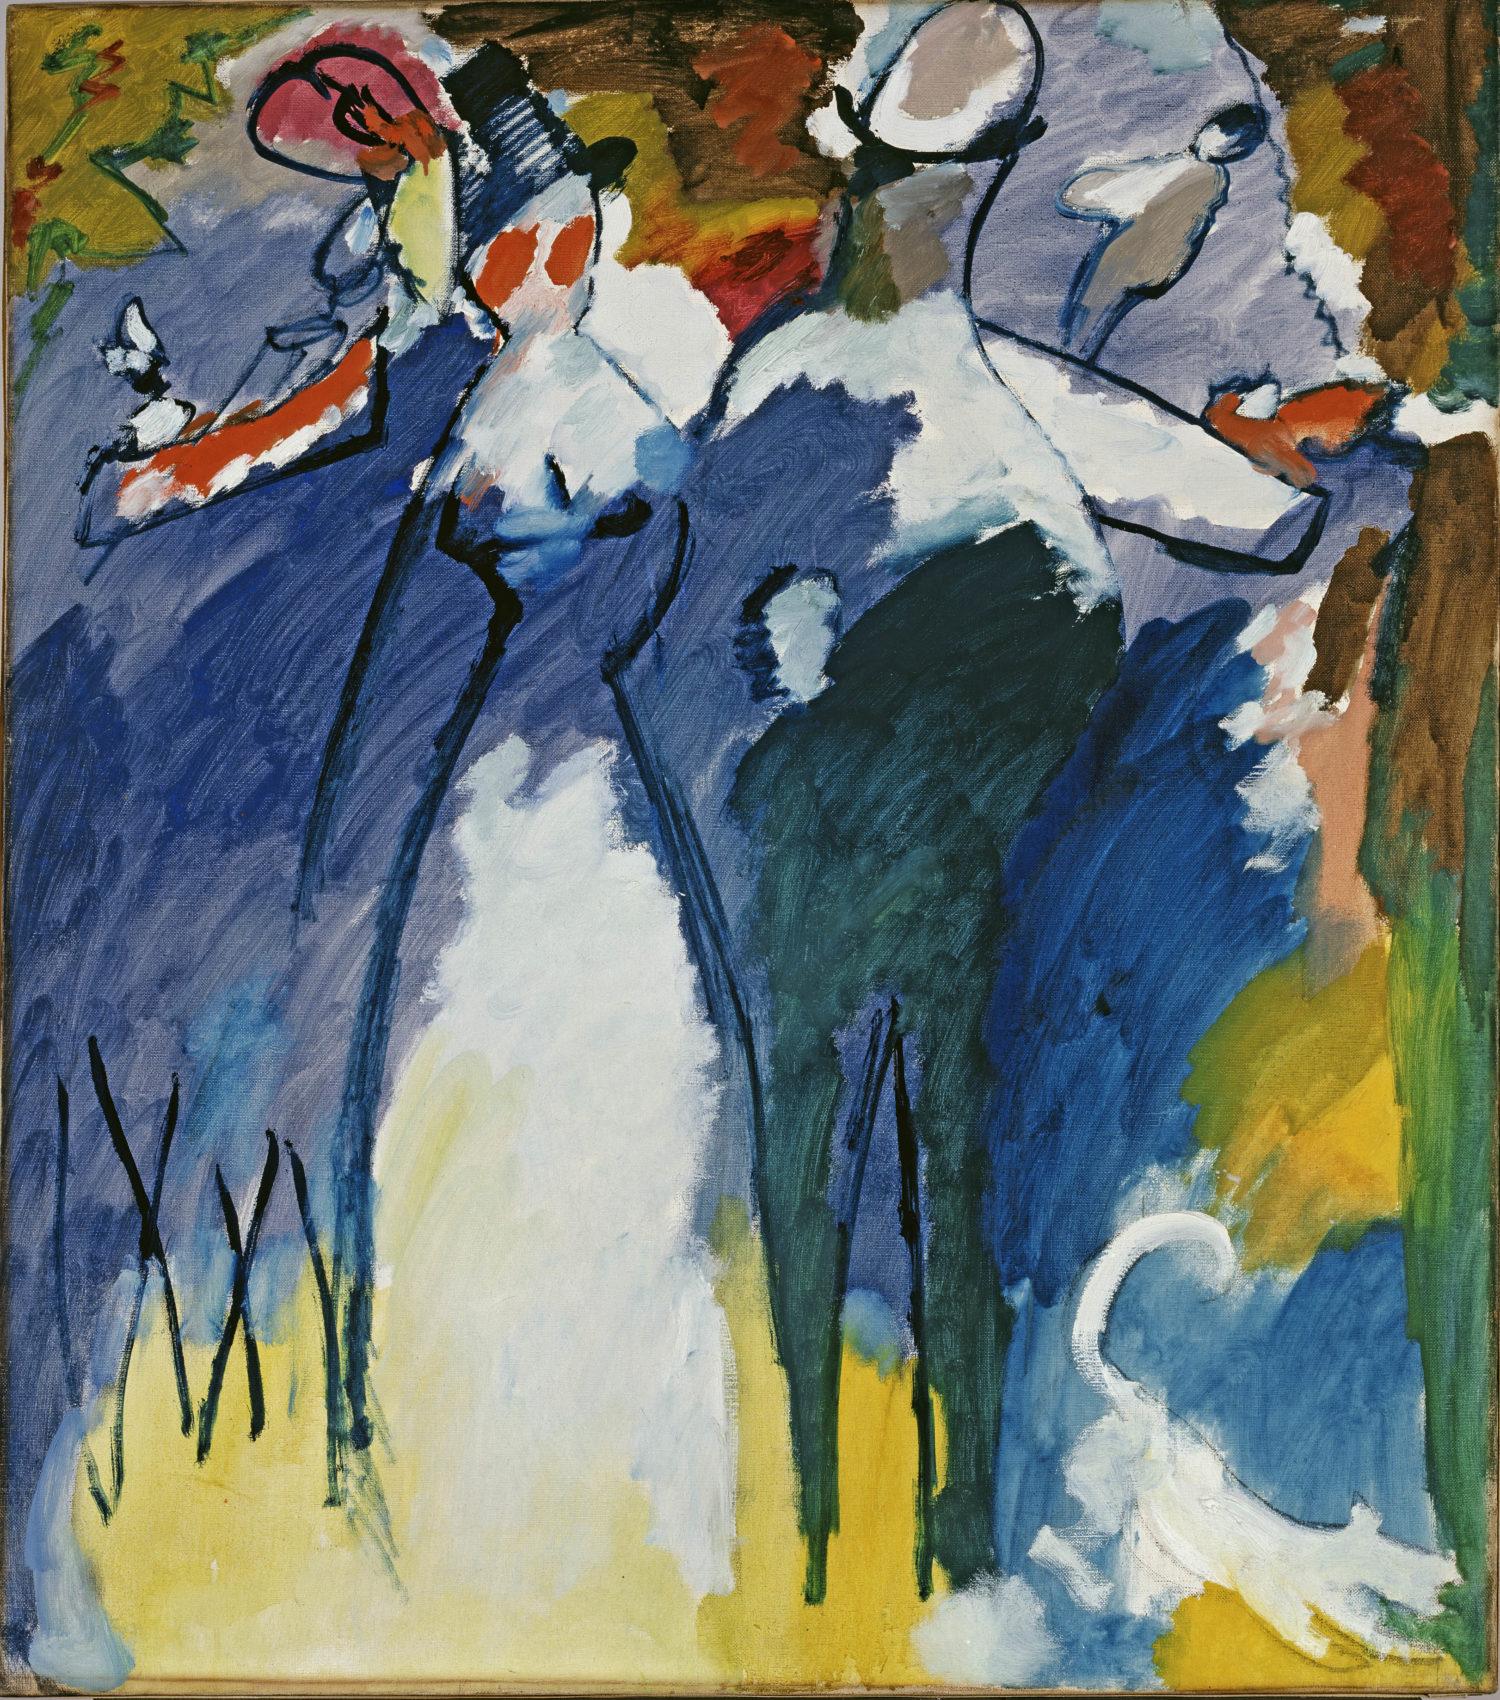 Wassily Kandinsky, Impression sonntag, 1911